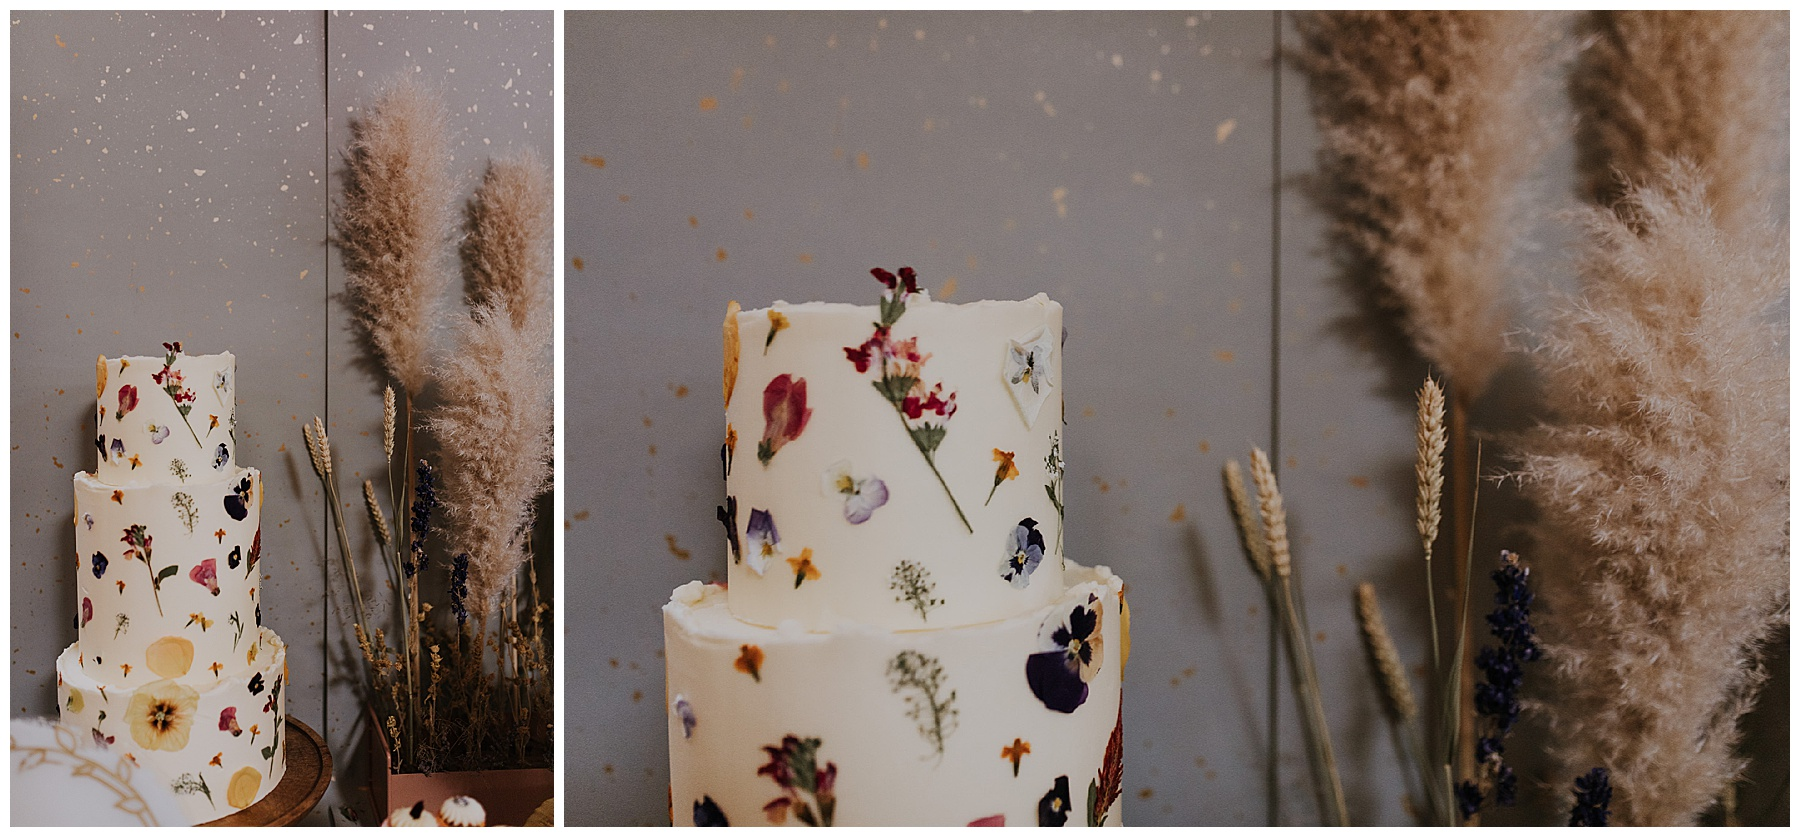 wedding cake with dried flowers